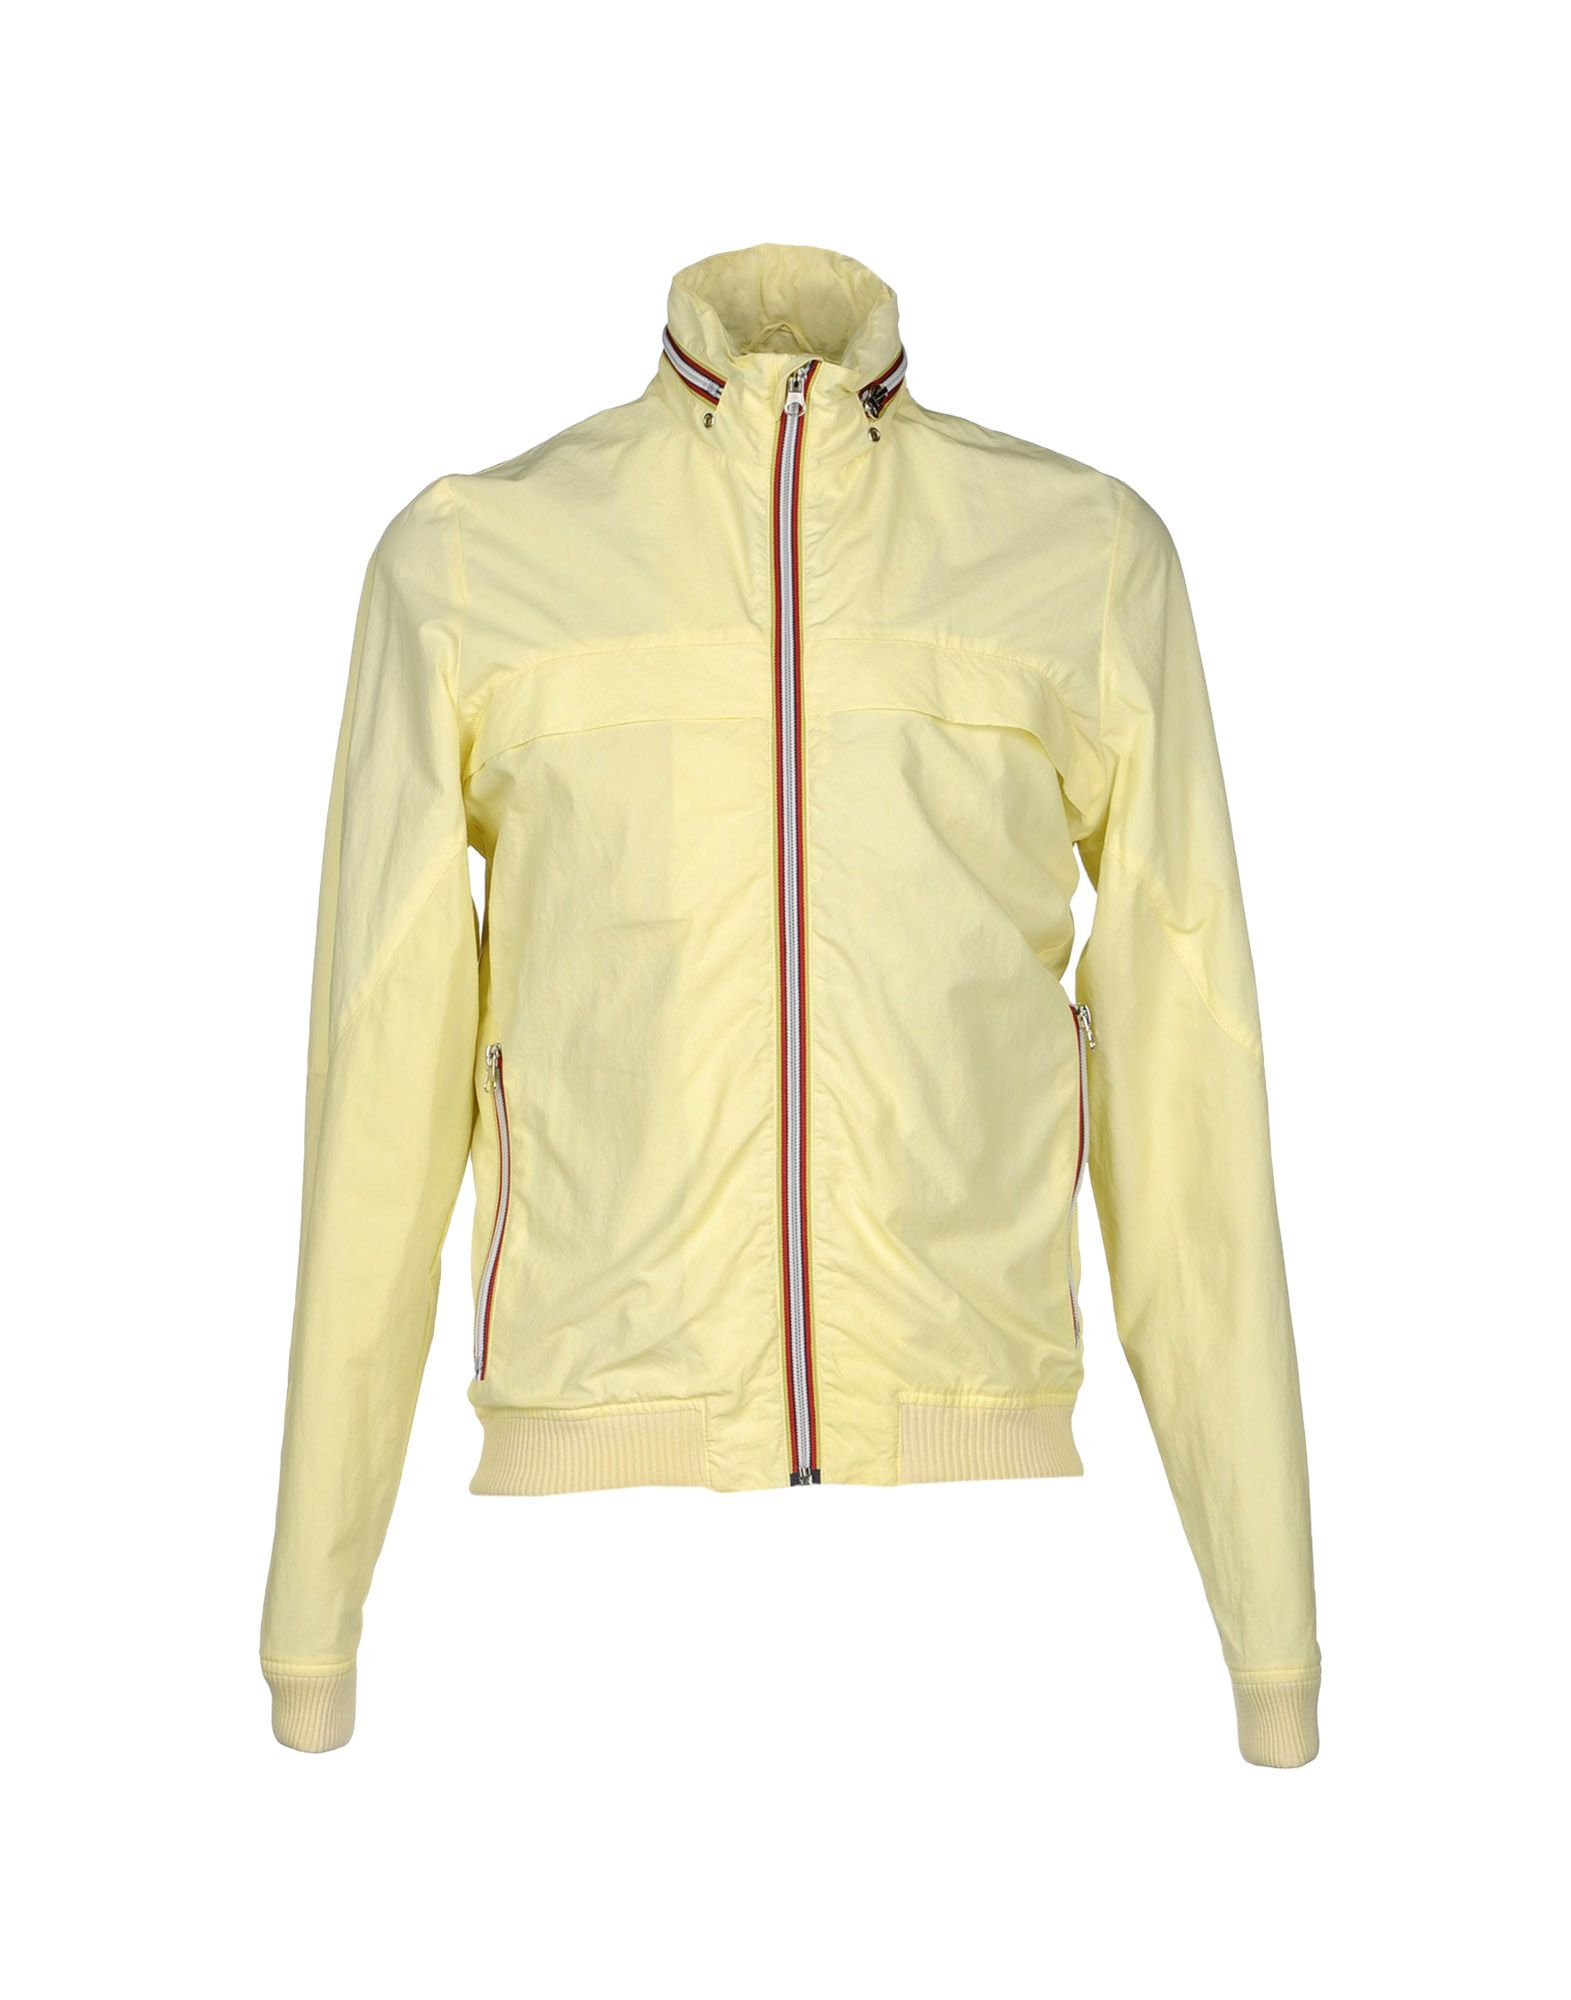 Gold bunny leather jacket